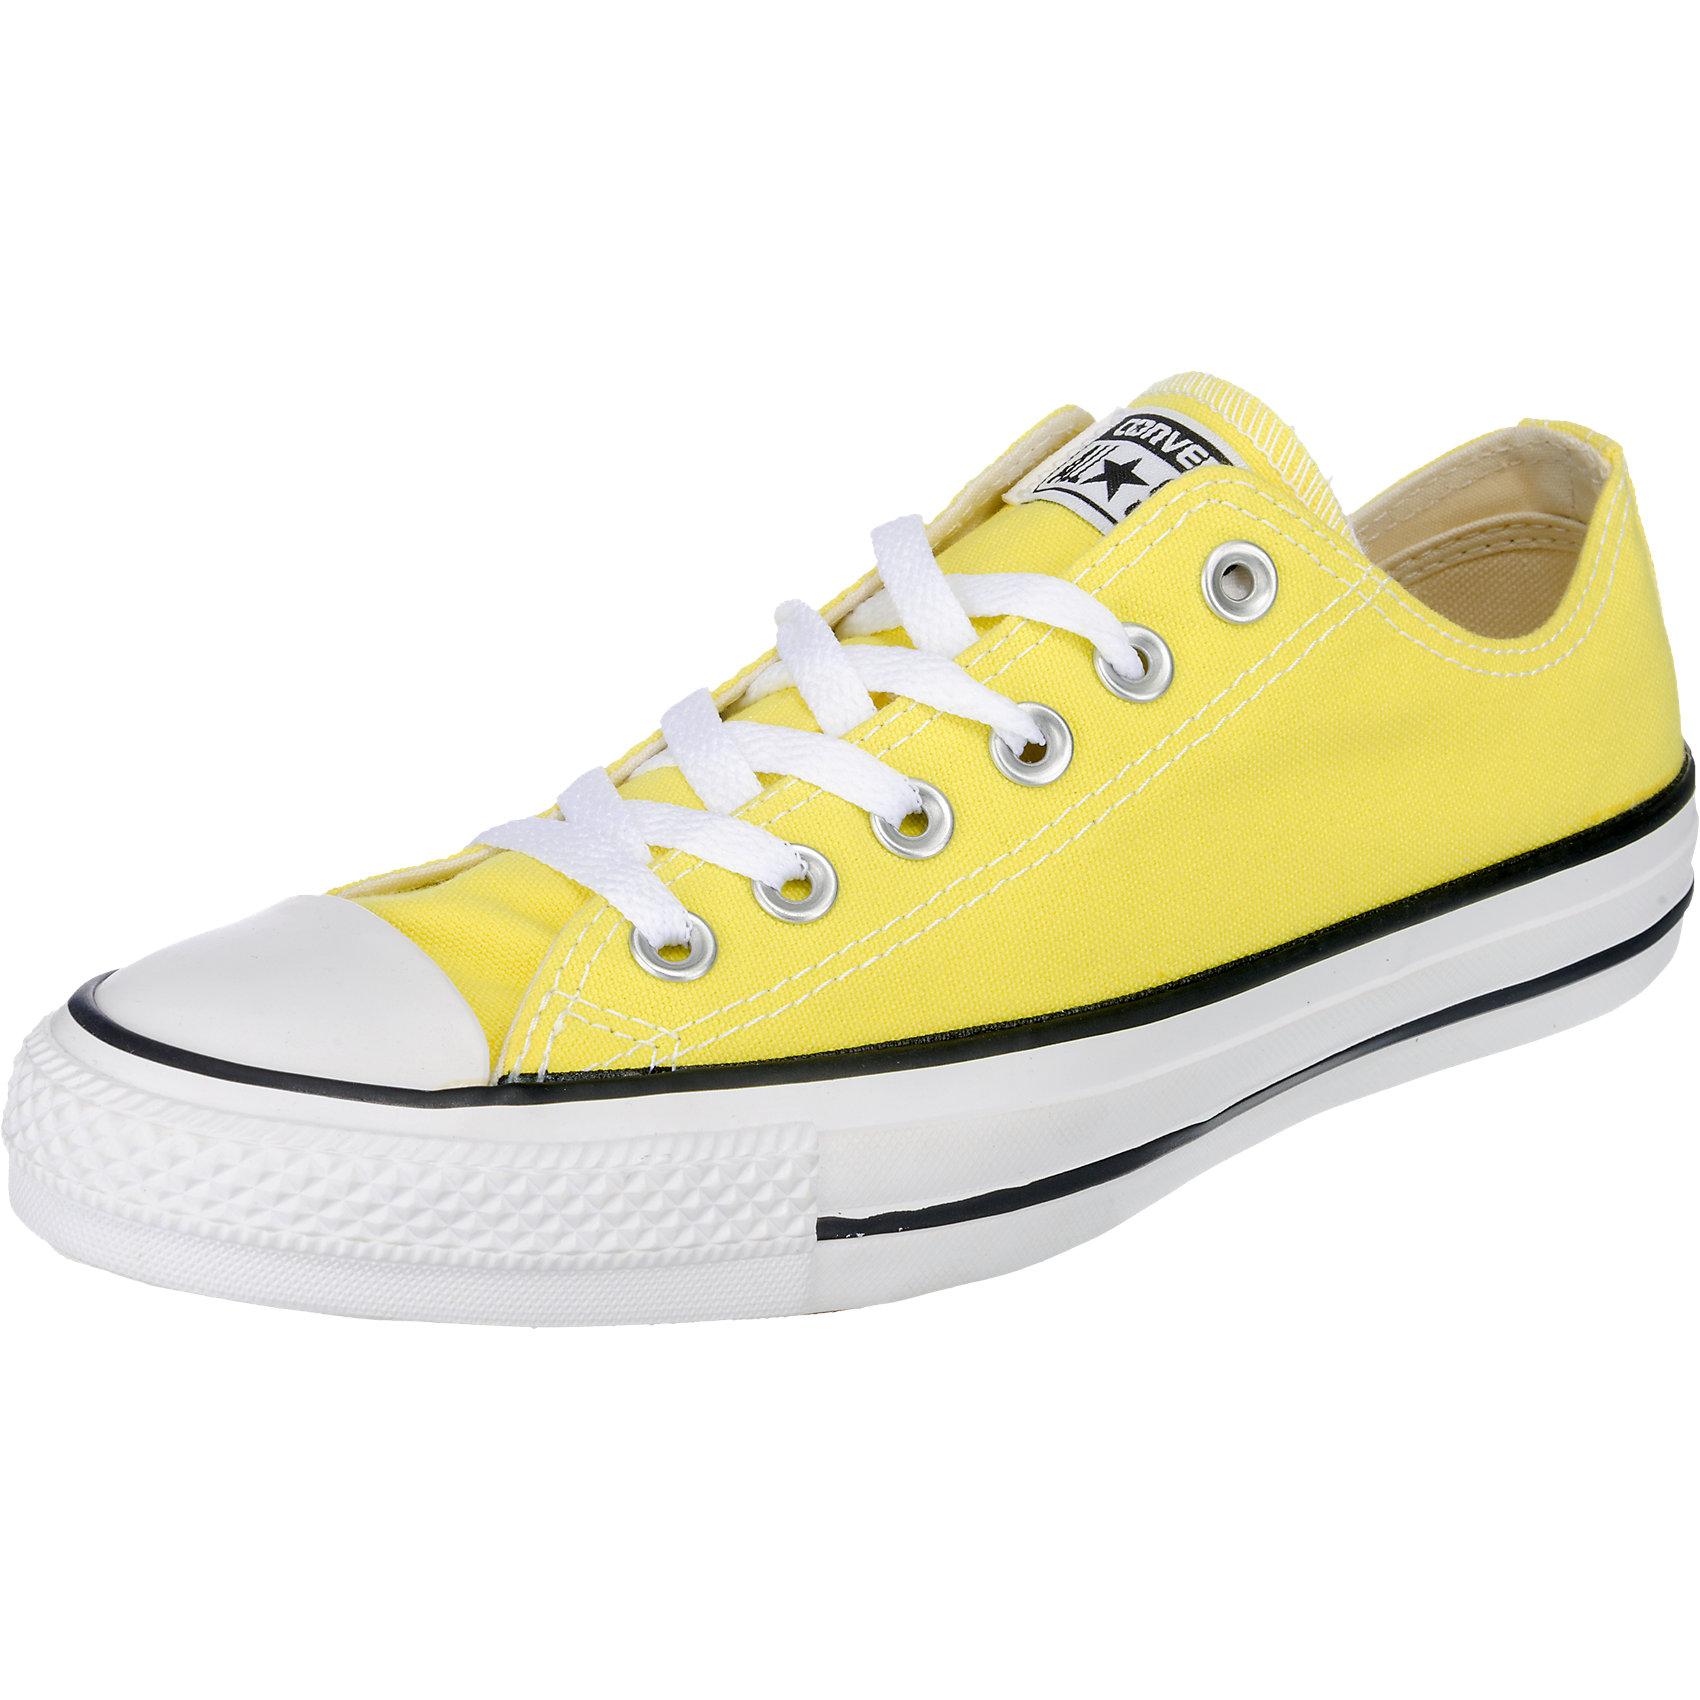 Neu CONVERSE Chuck Taylor All Star Star Star Ox Sneakers gelb 5772575 264808